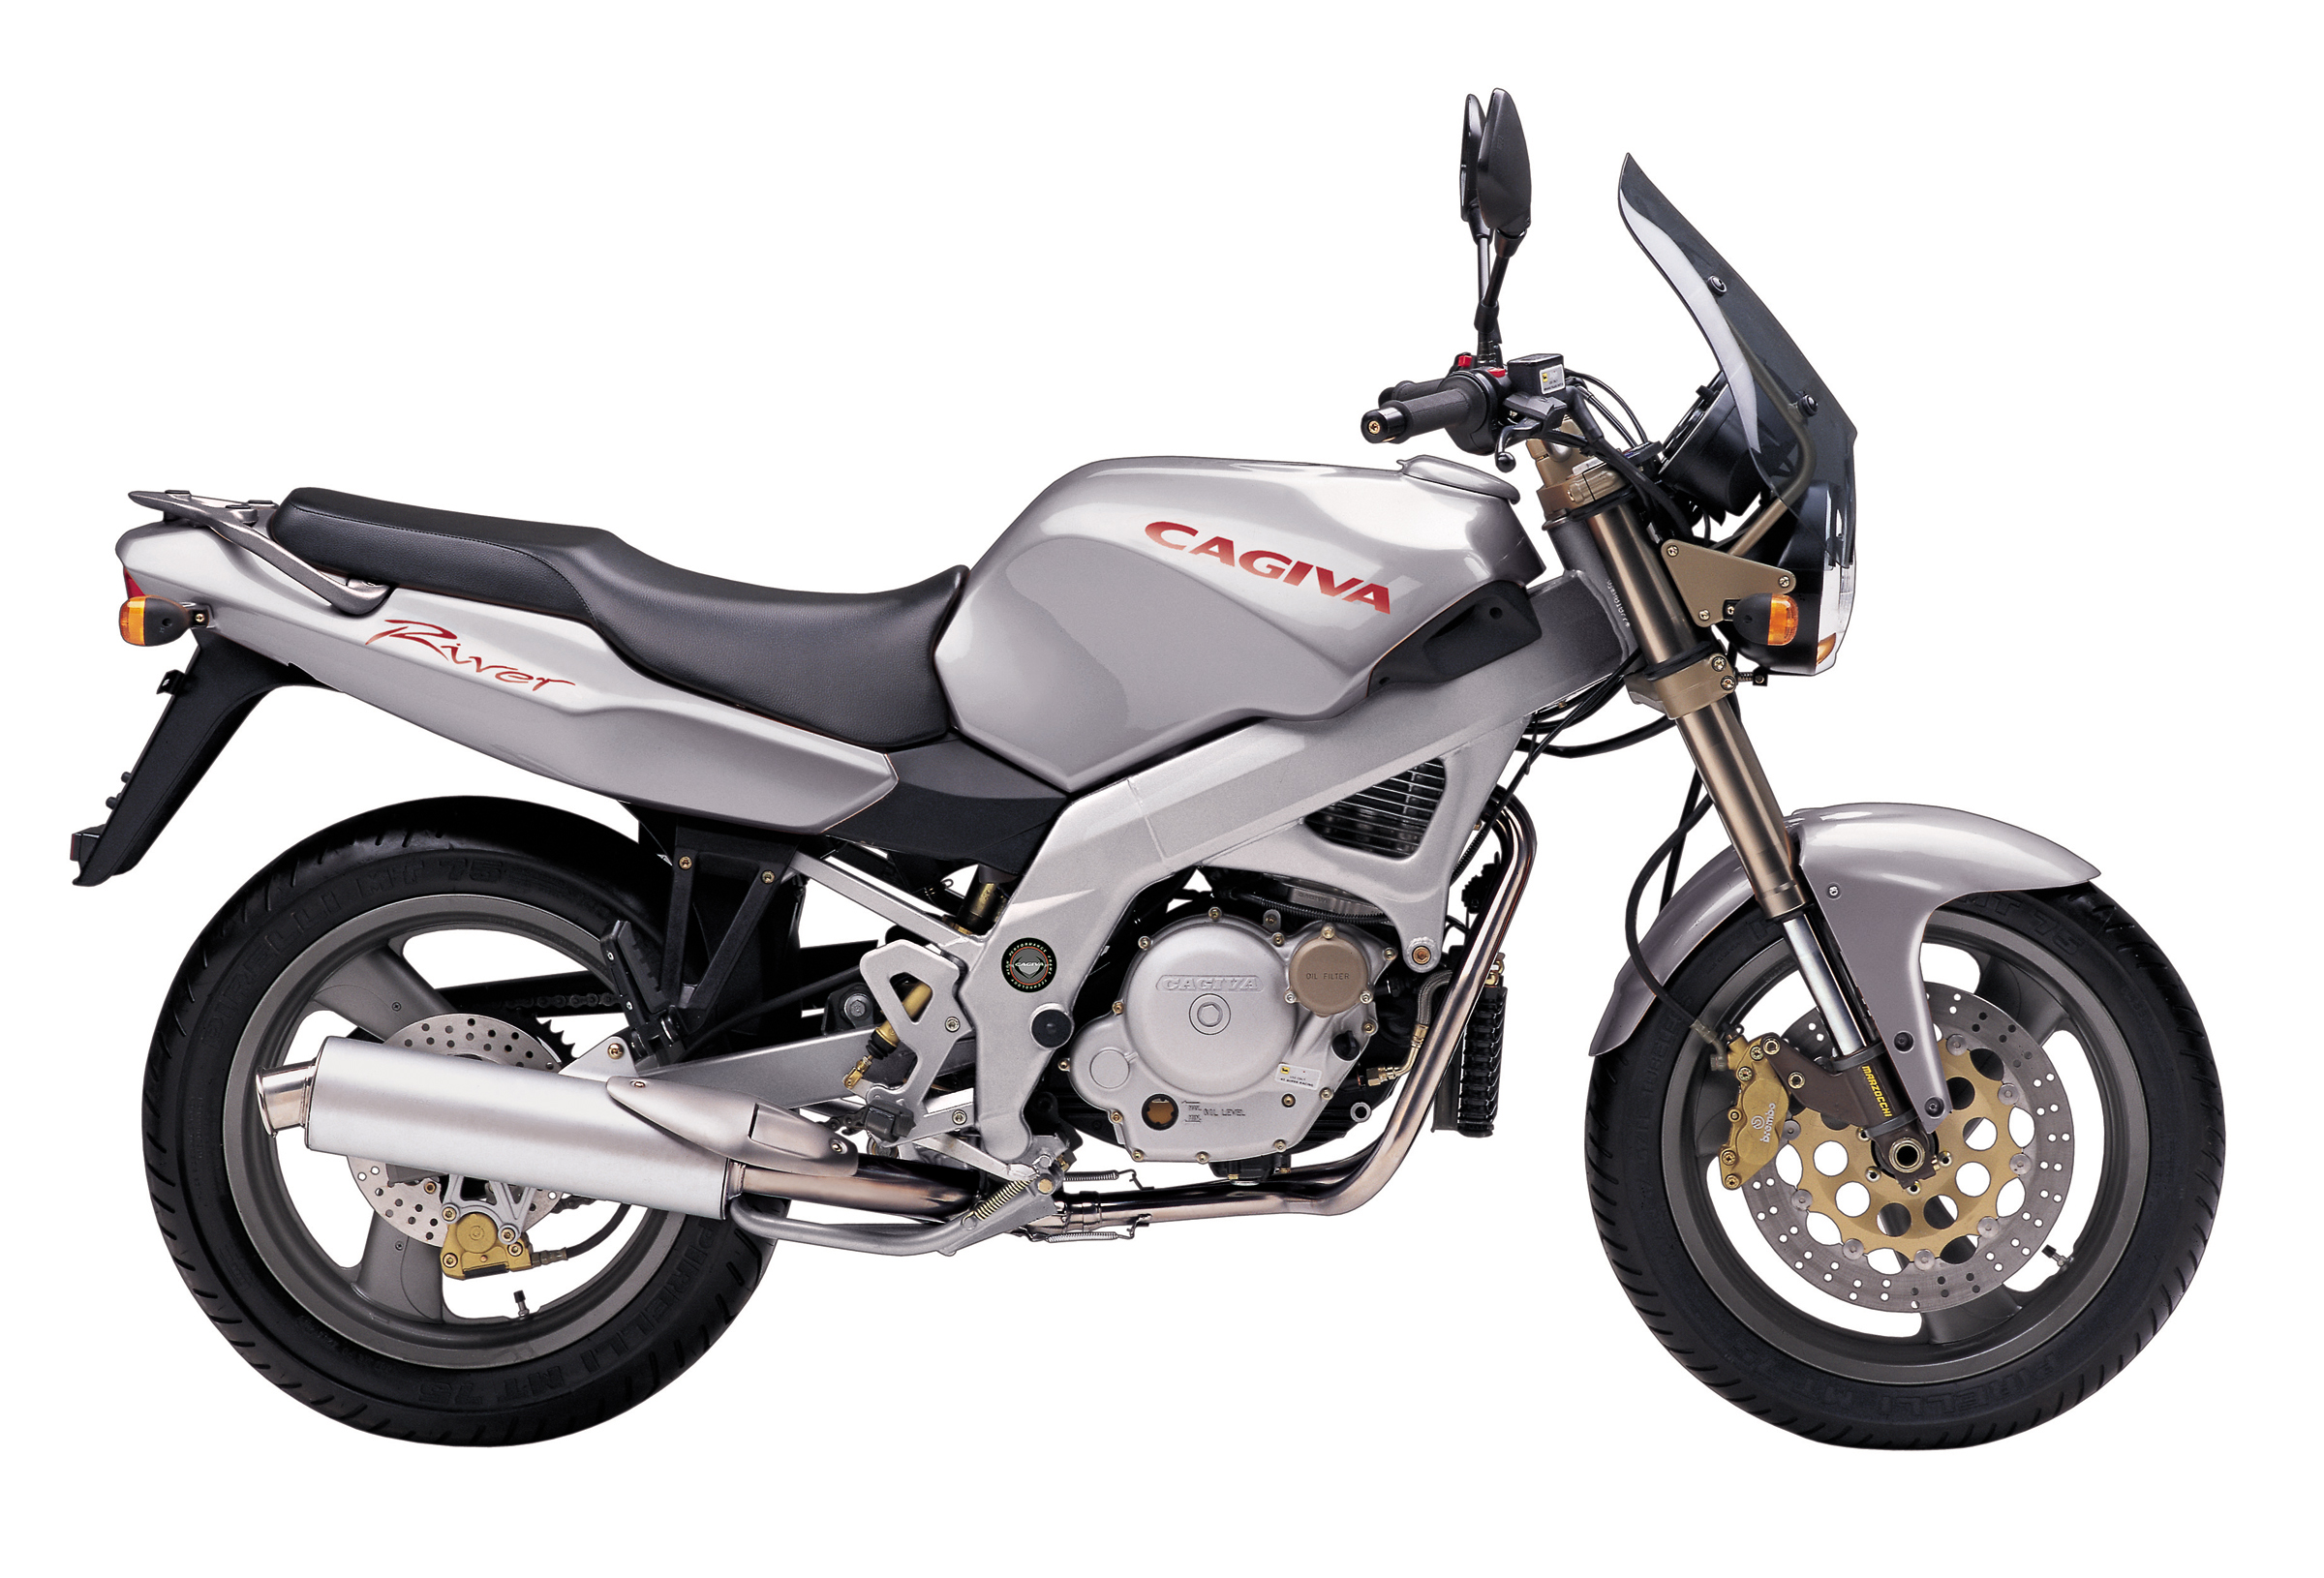 ampoules effet xenon pour moto toute CAGIVA River 600